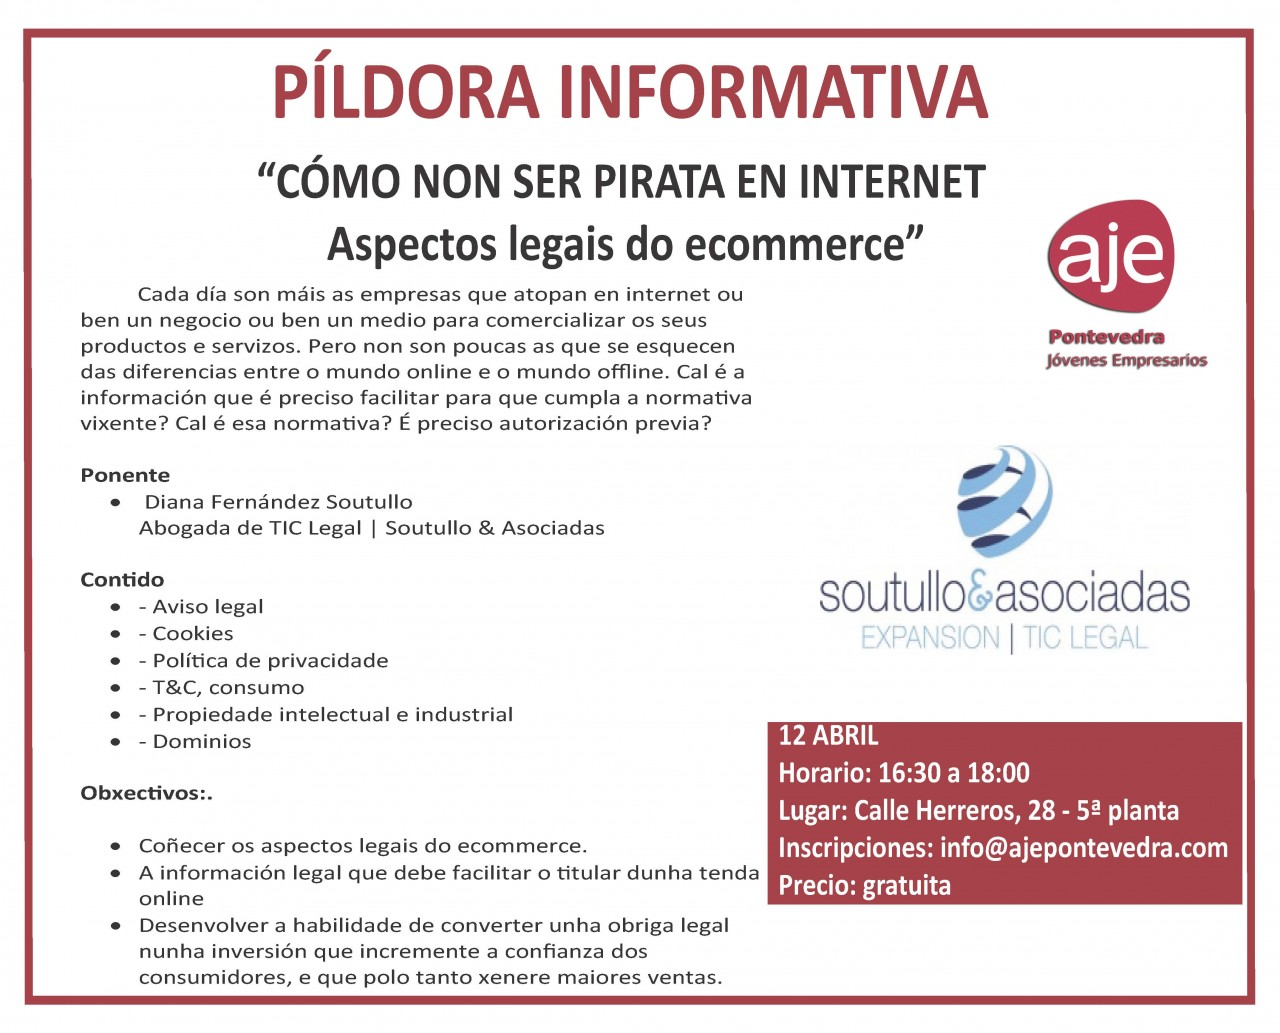 cartel pildora informativa como no ser pirata en internet1